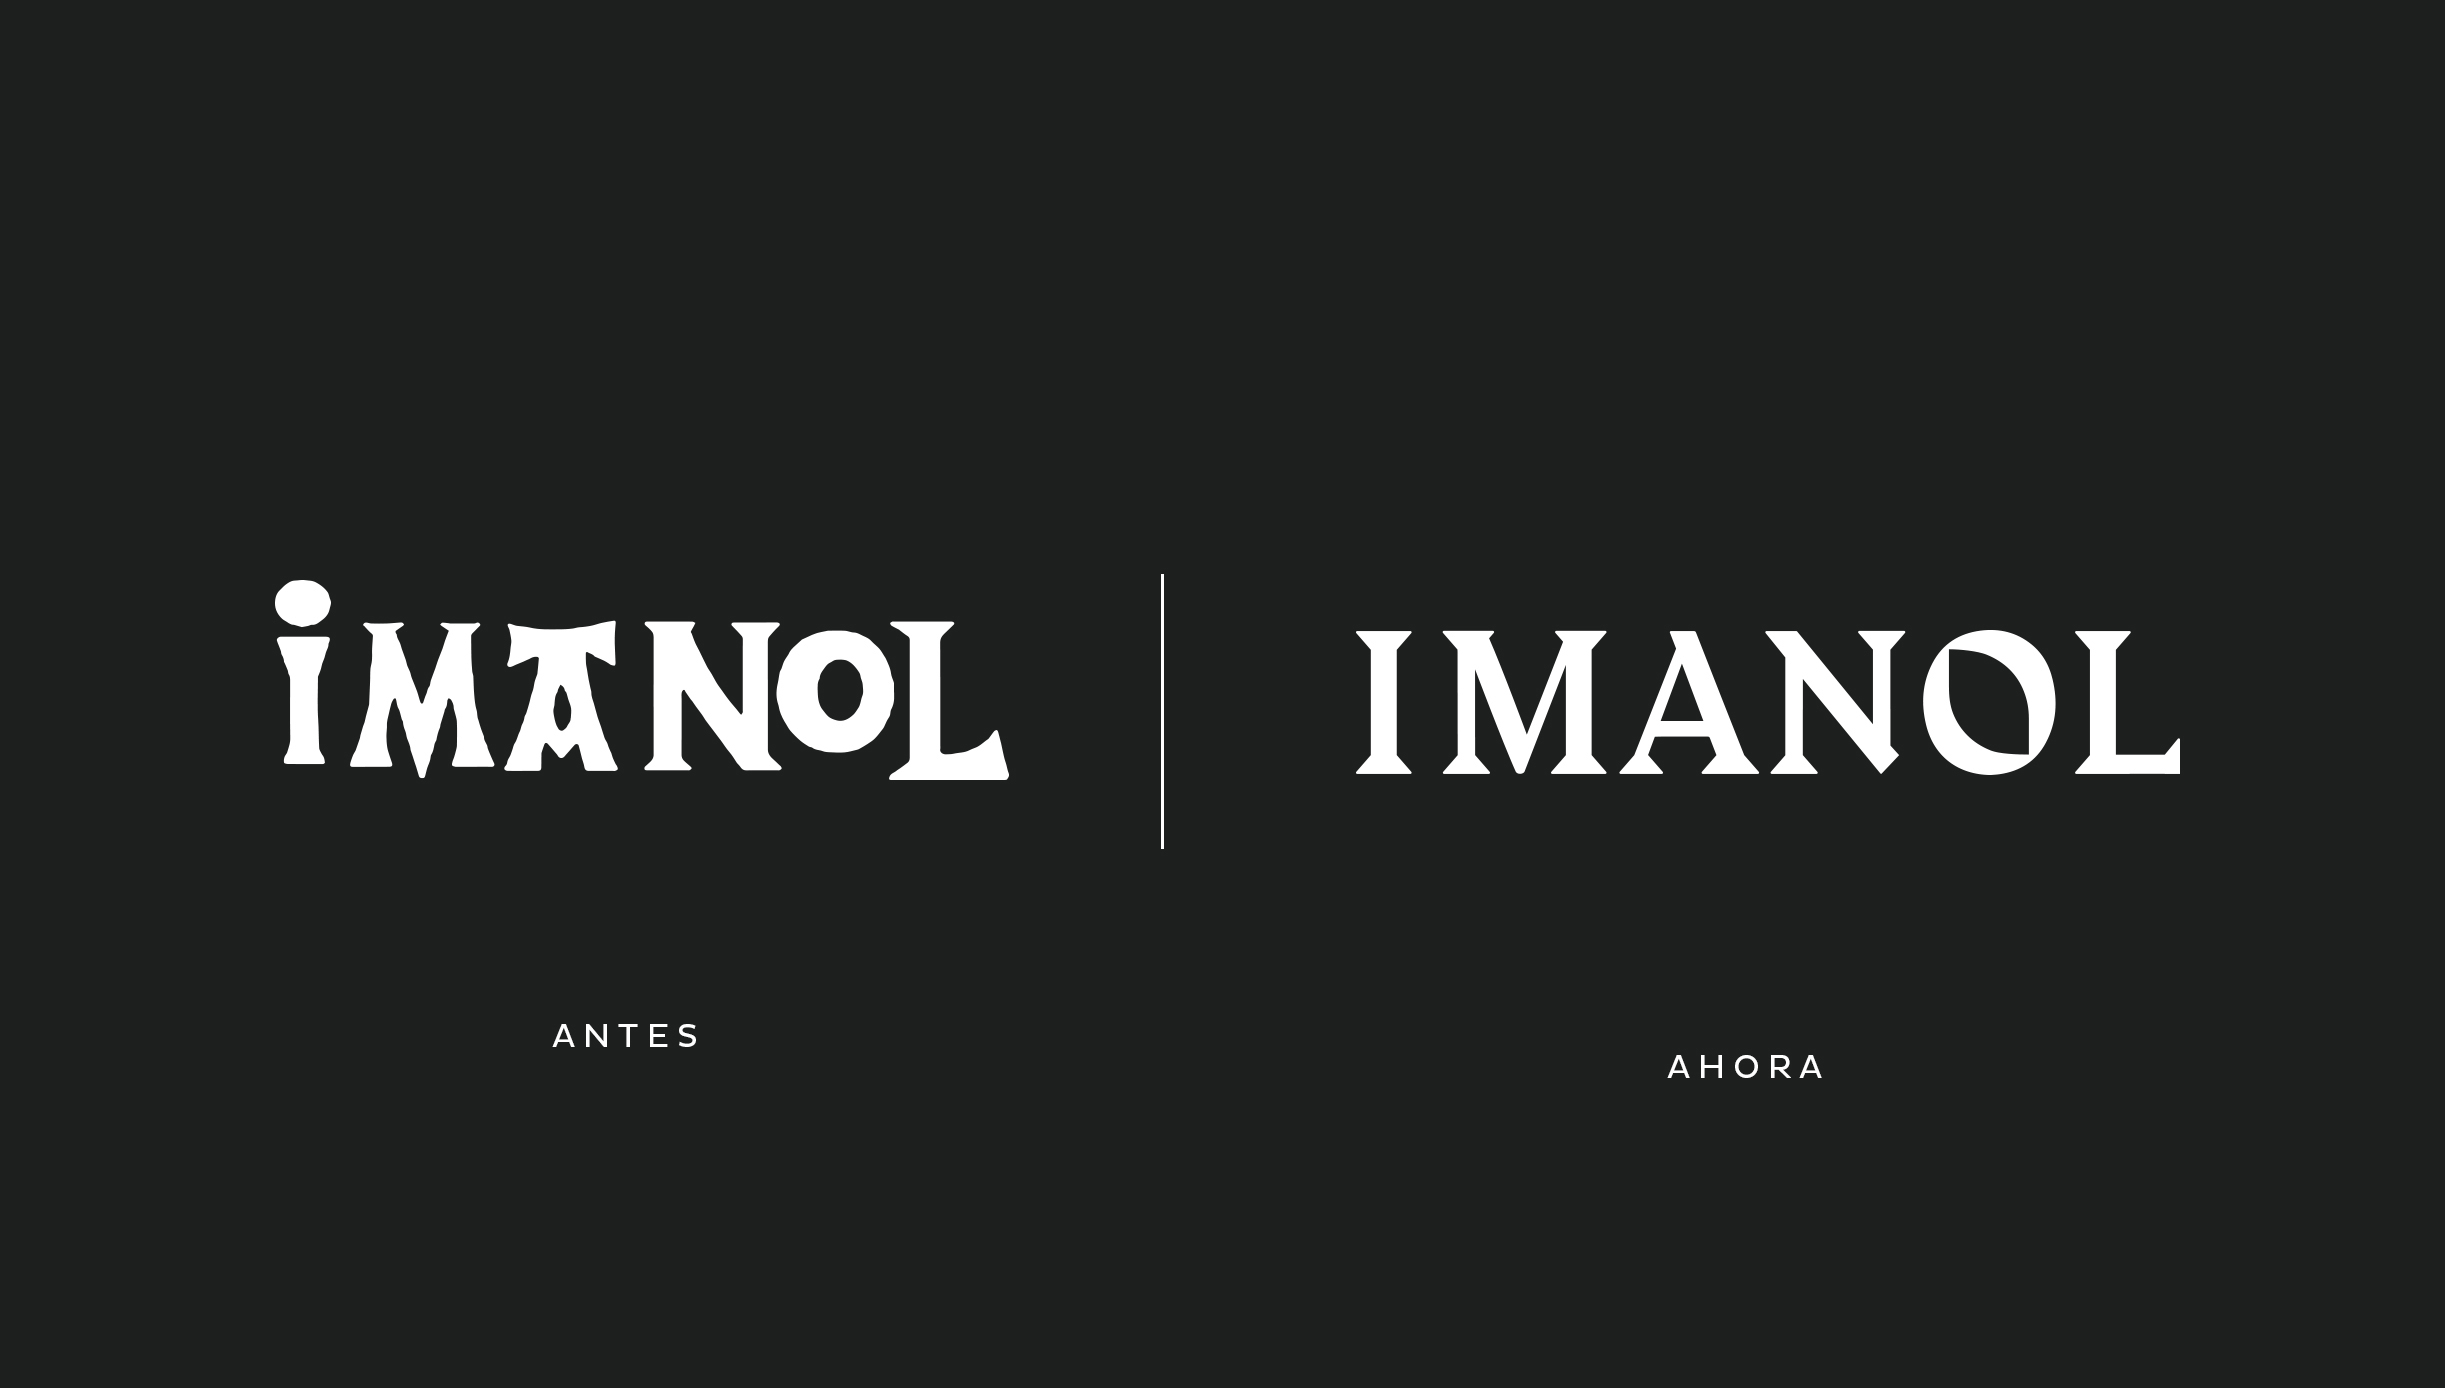 imanol-angel-espinosa-003C-1